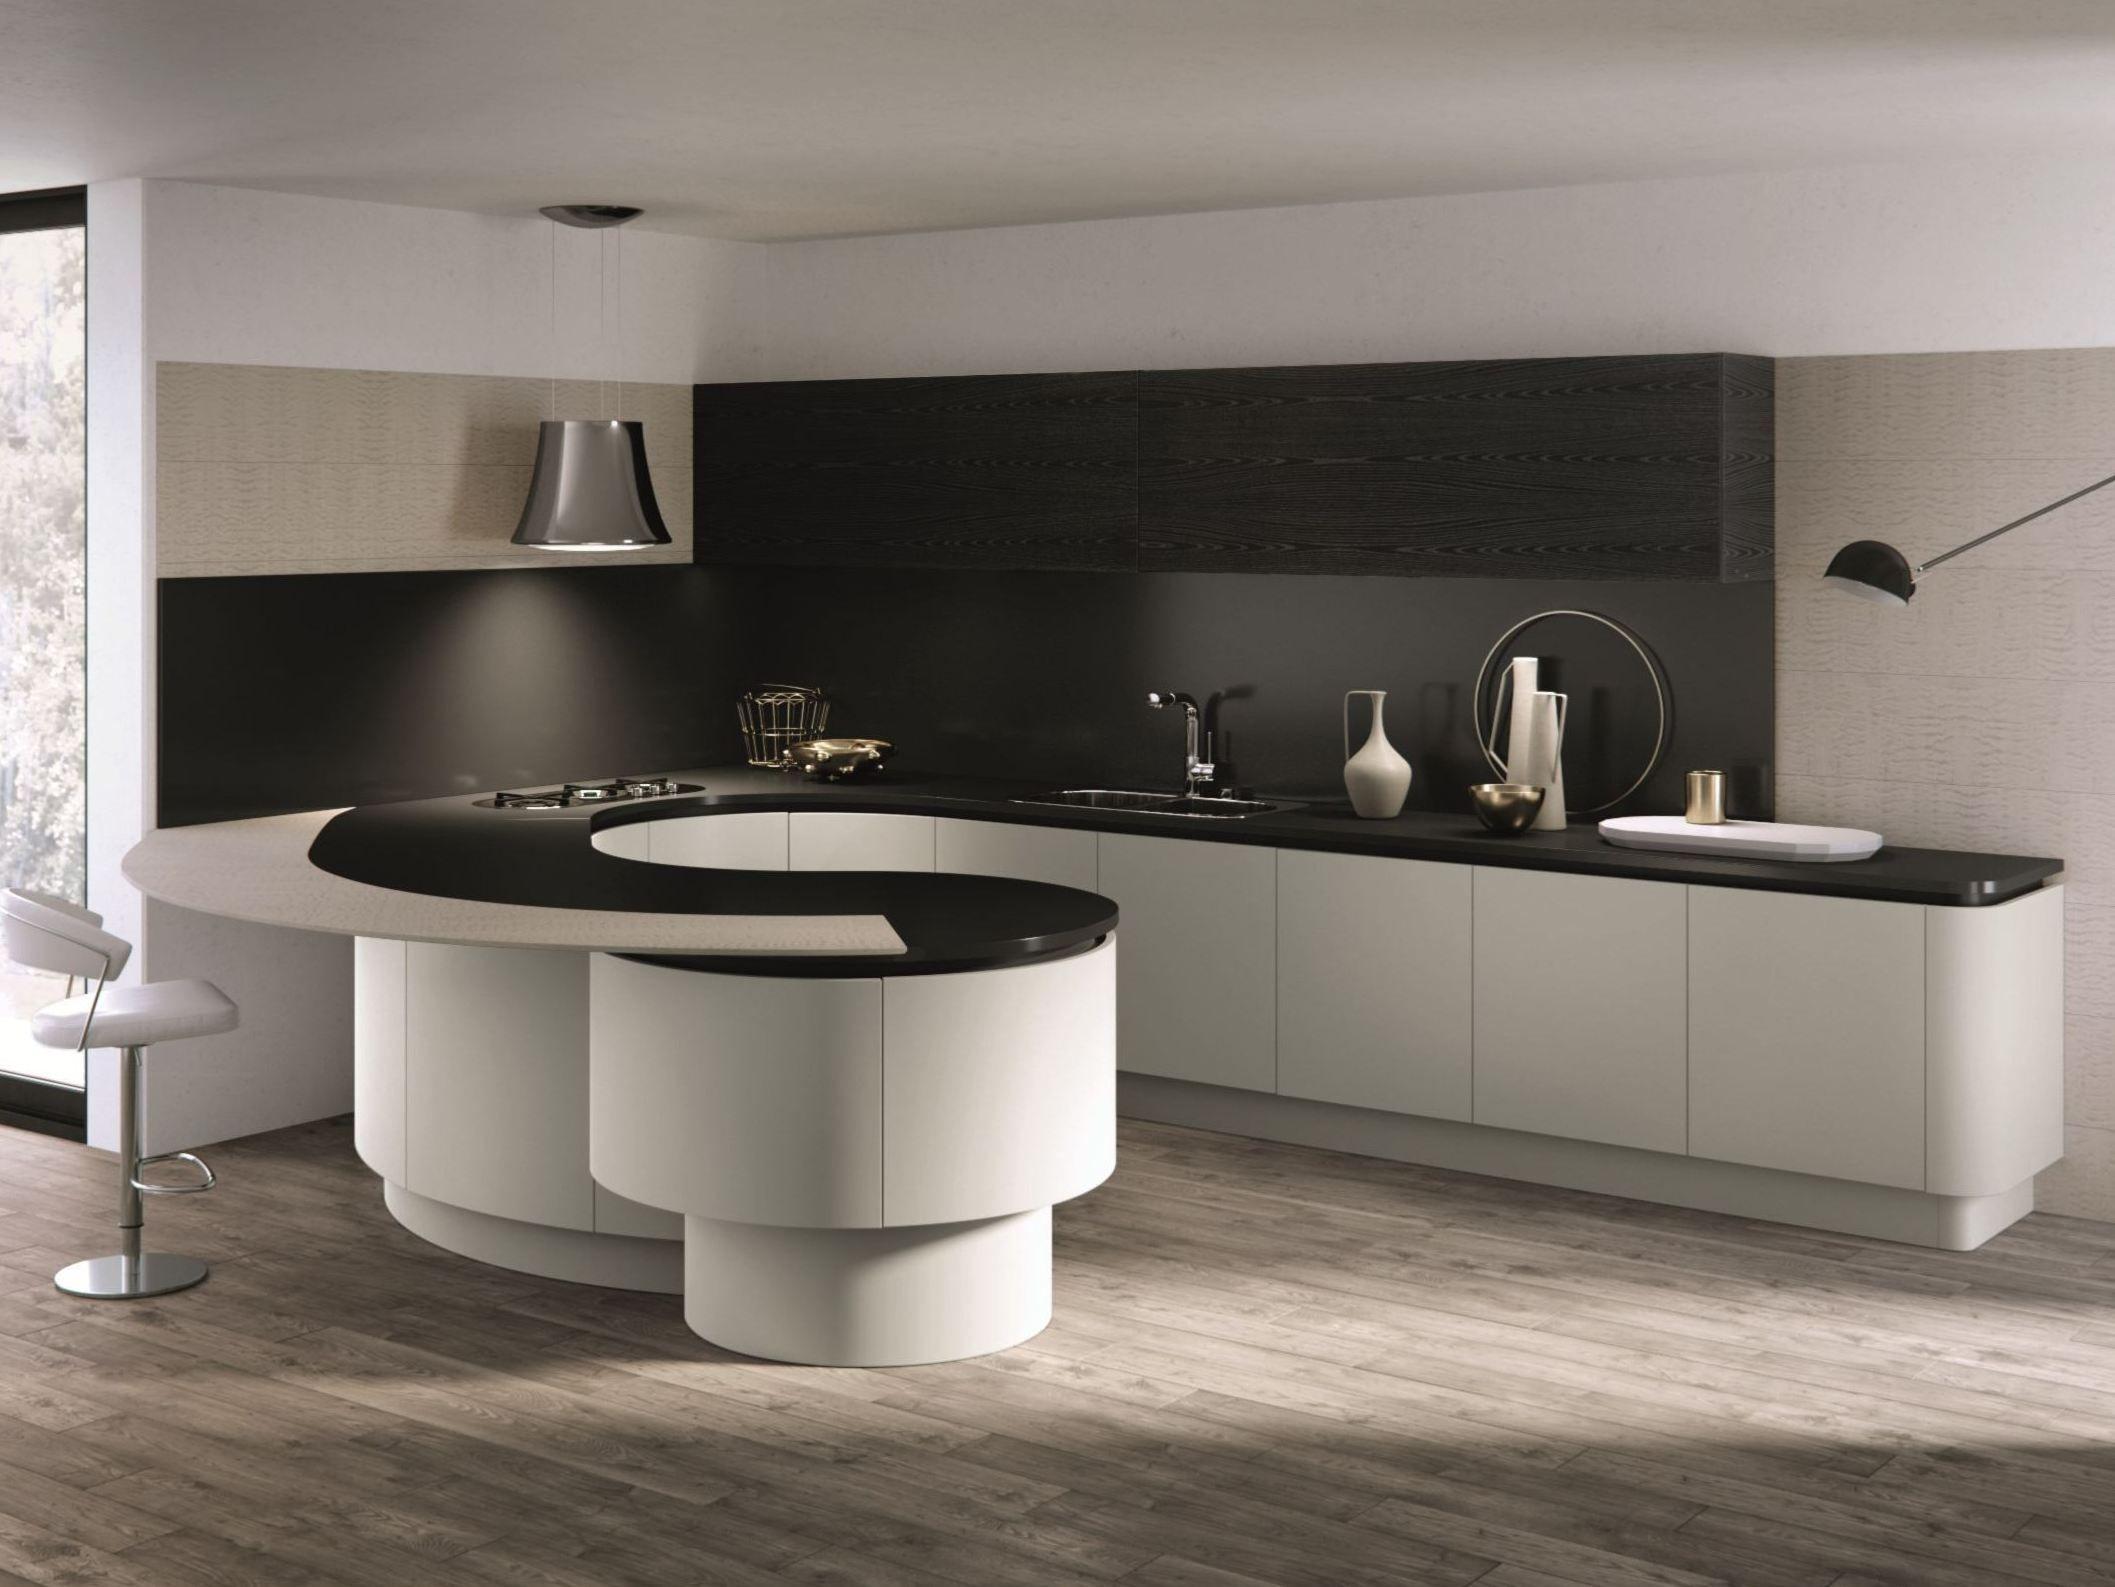 Cucina Design : Illuminazione Cucina Design: Anteprima Salone 2016  #756556 2115 1587 Cucina Design 2016